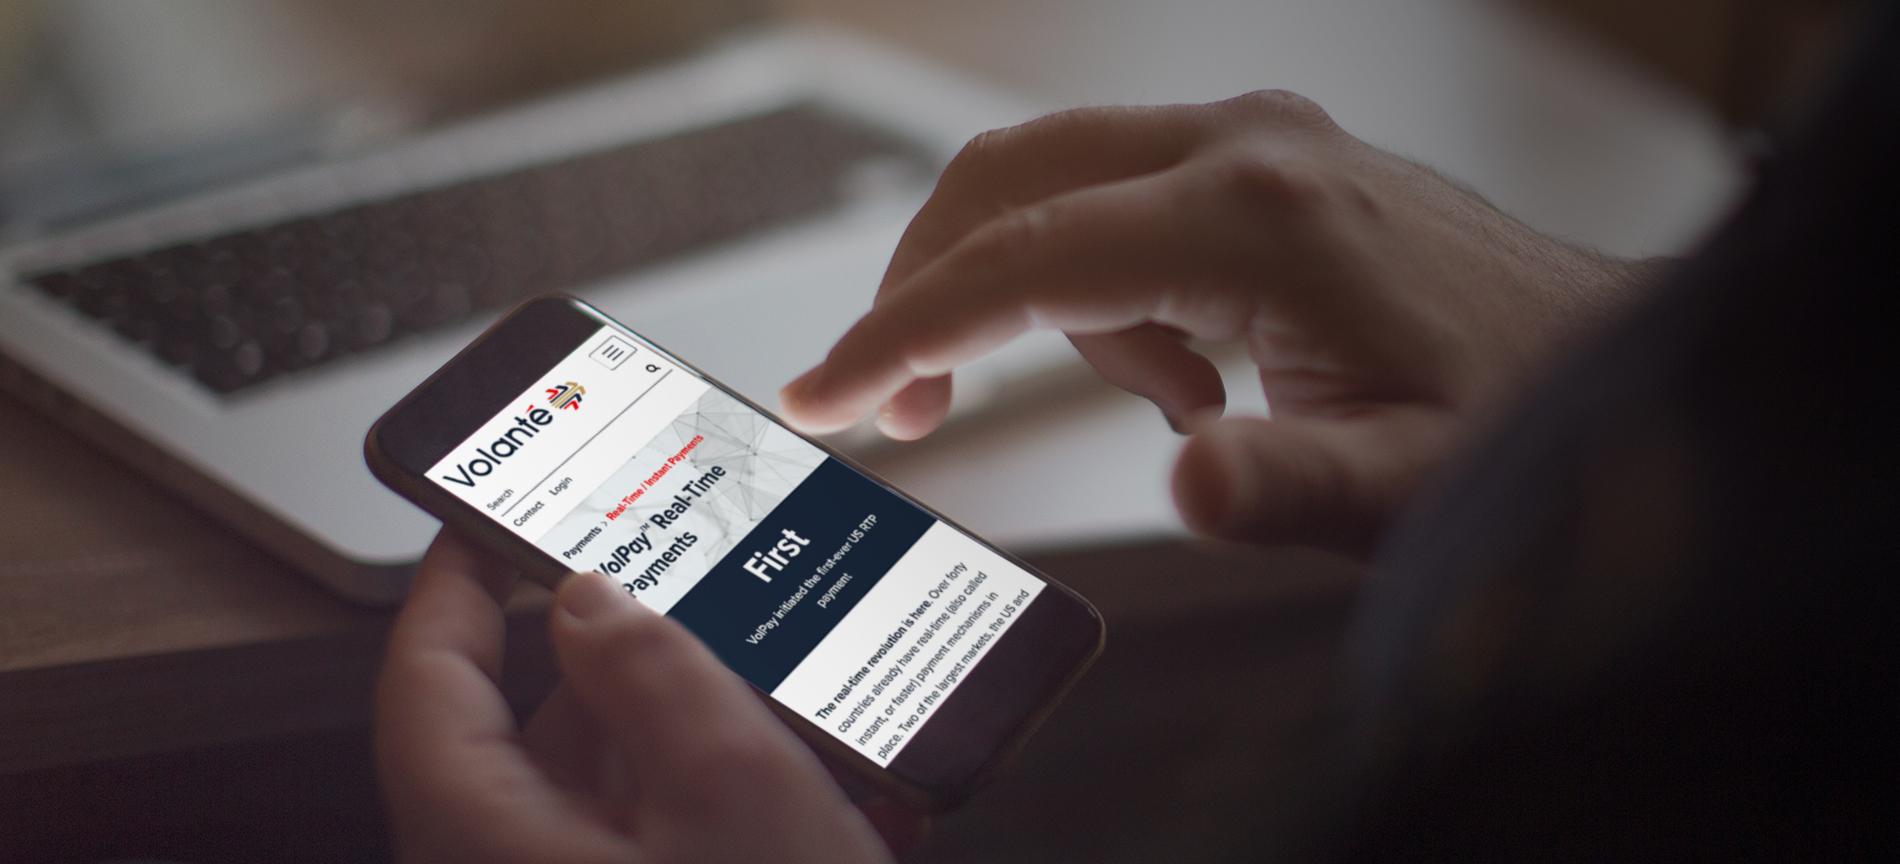 Volante website viewed on an iPhone - desktop